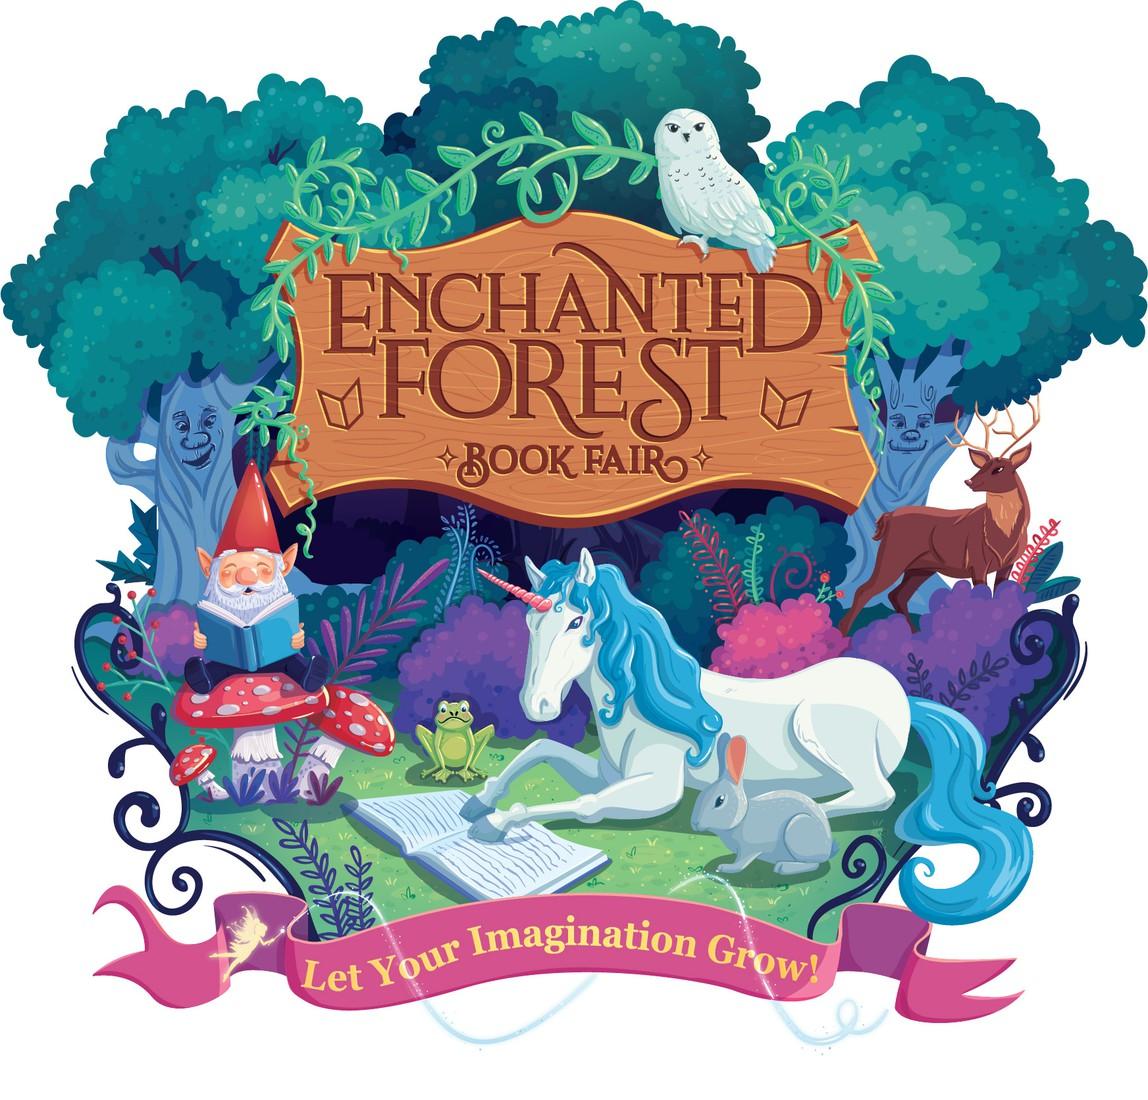 Enchanted Forest Book Fair Logo